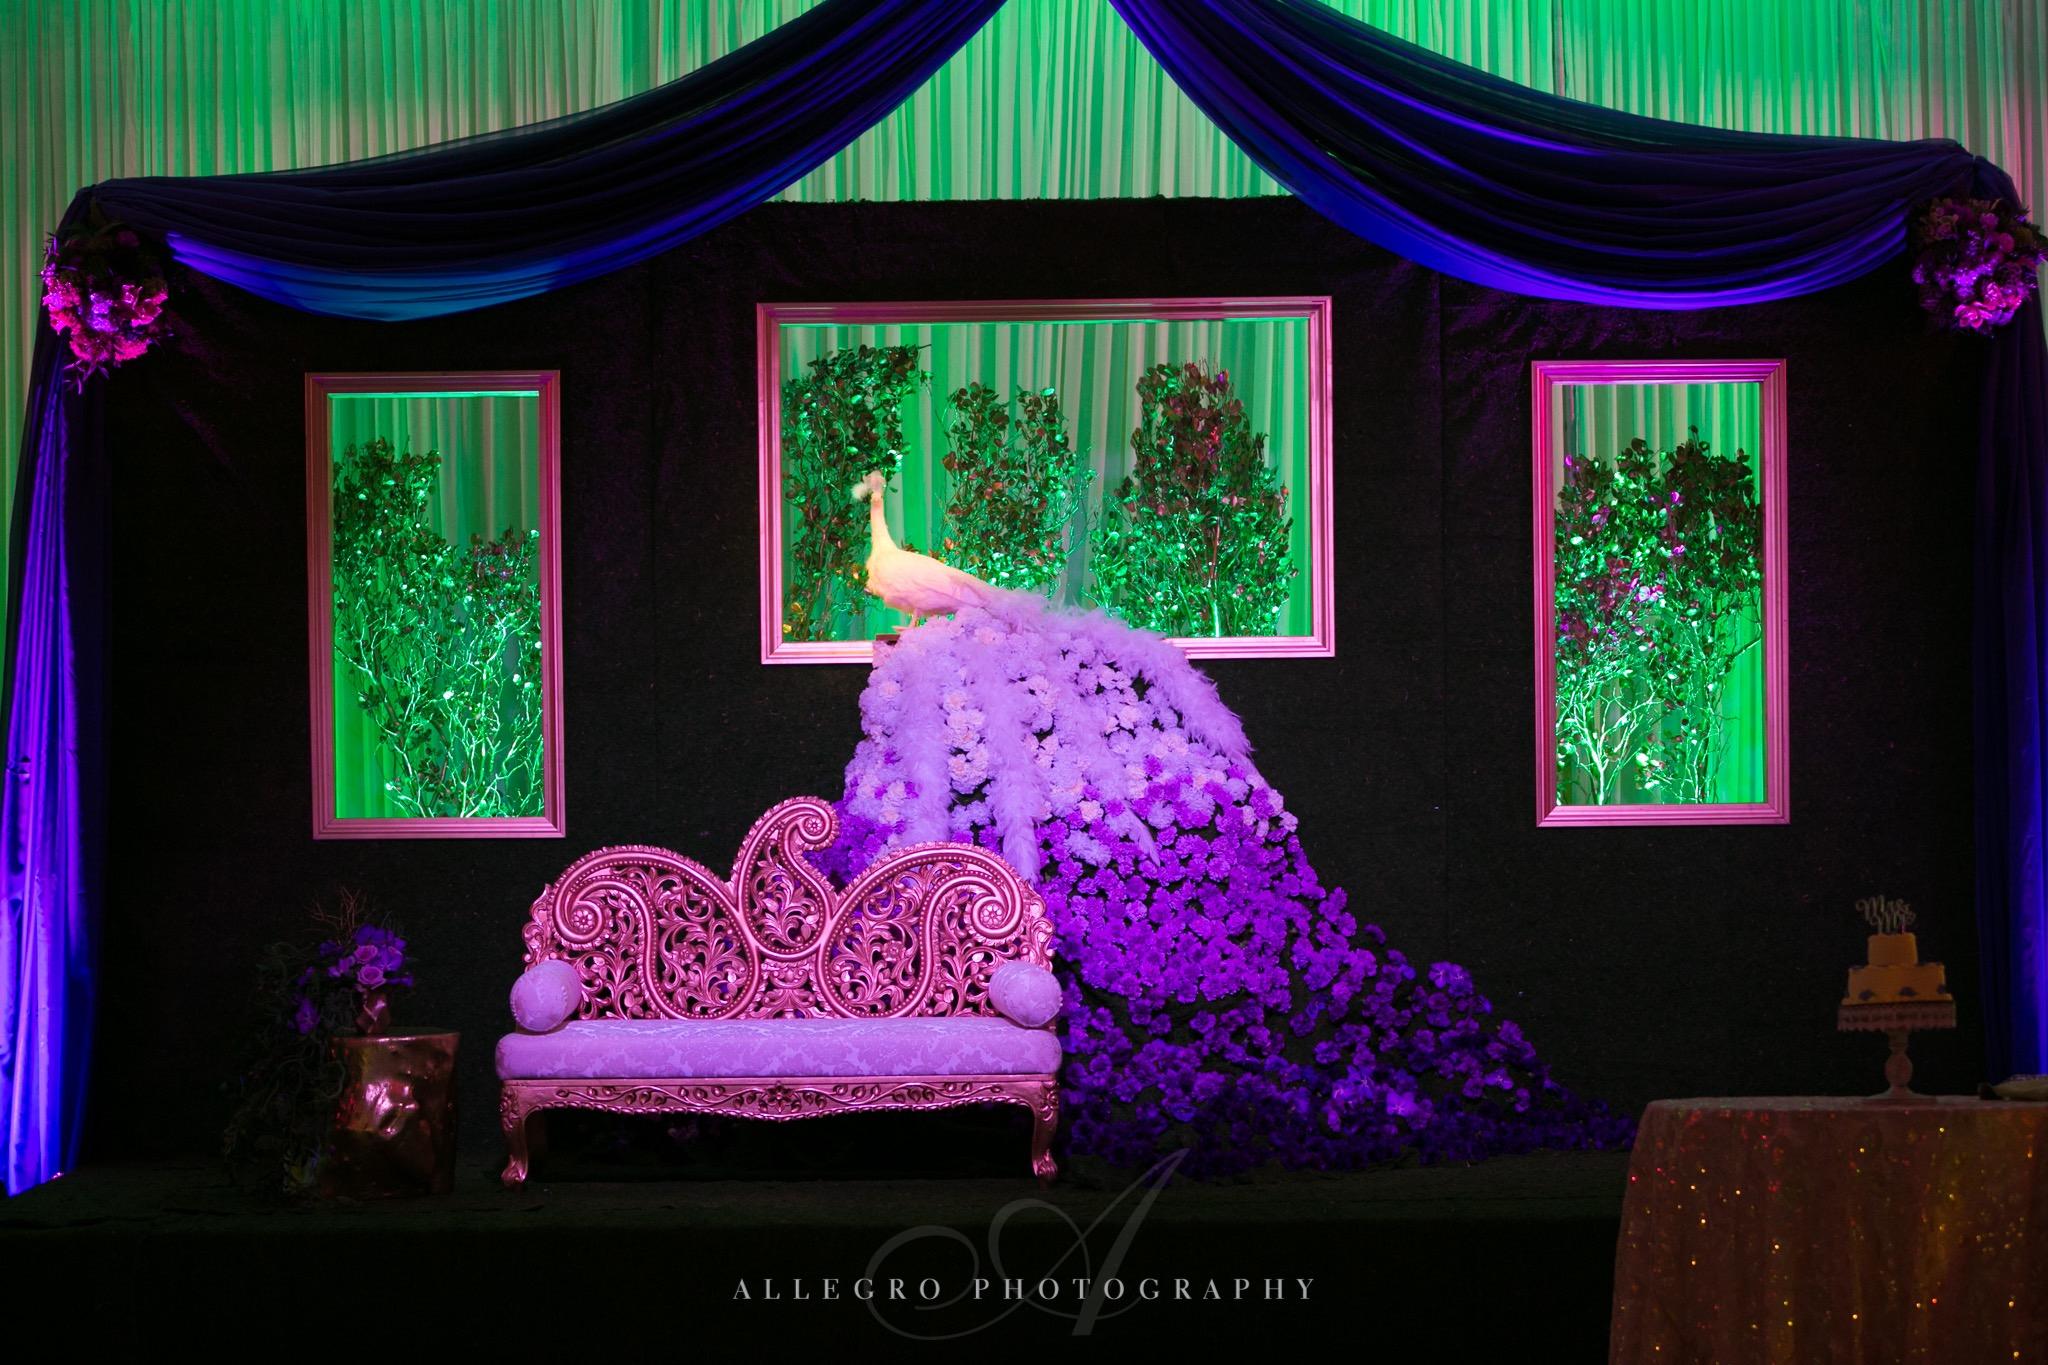 flou(-e)r_specialty_floral_events_wedding_flower_design_inspiration